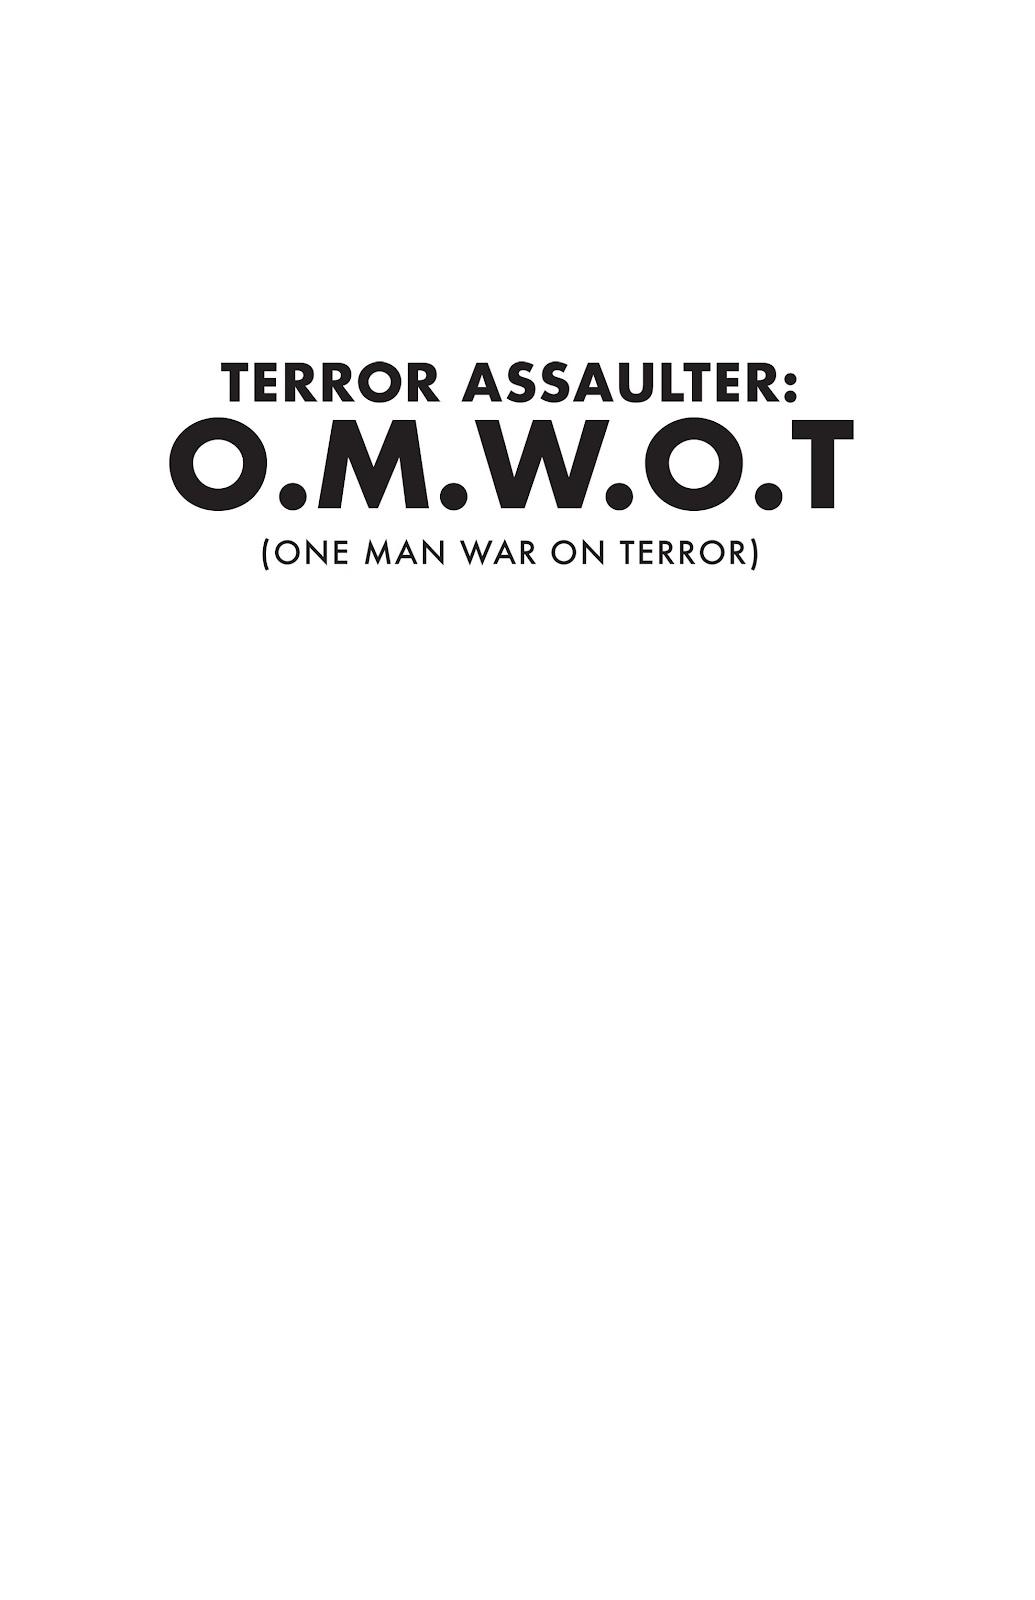 Read online Terror Assaulter: O.M.W.O.T (One Man War On Terror) comic -  Issue # TPB - 3